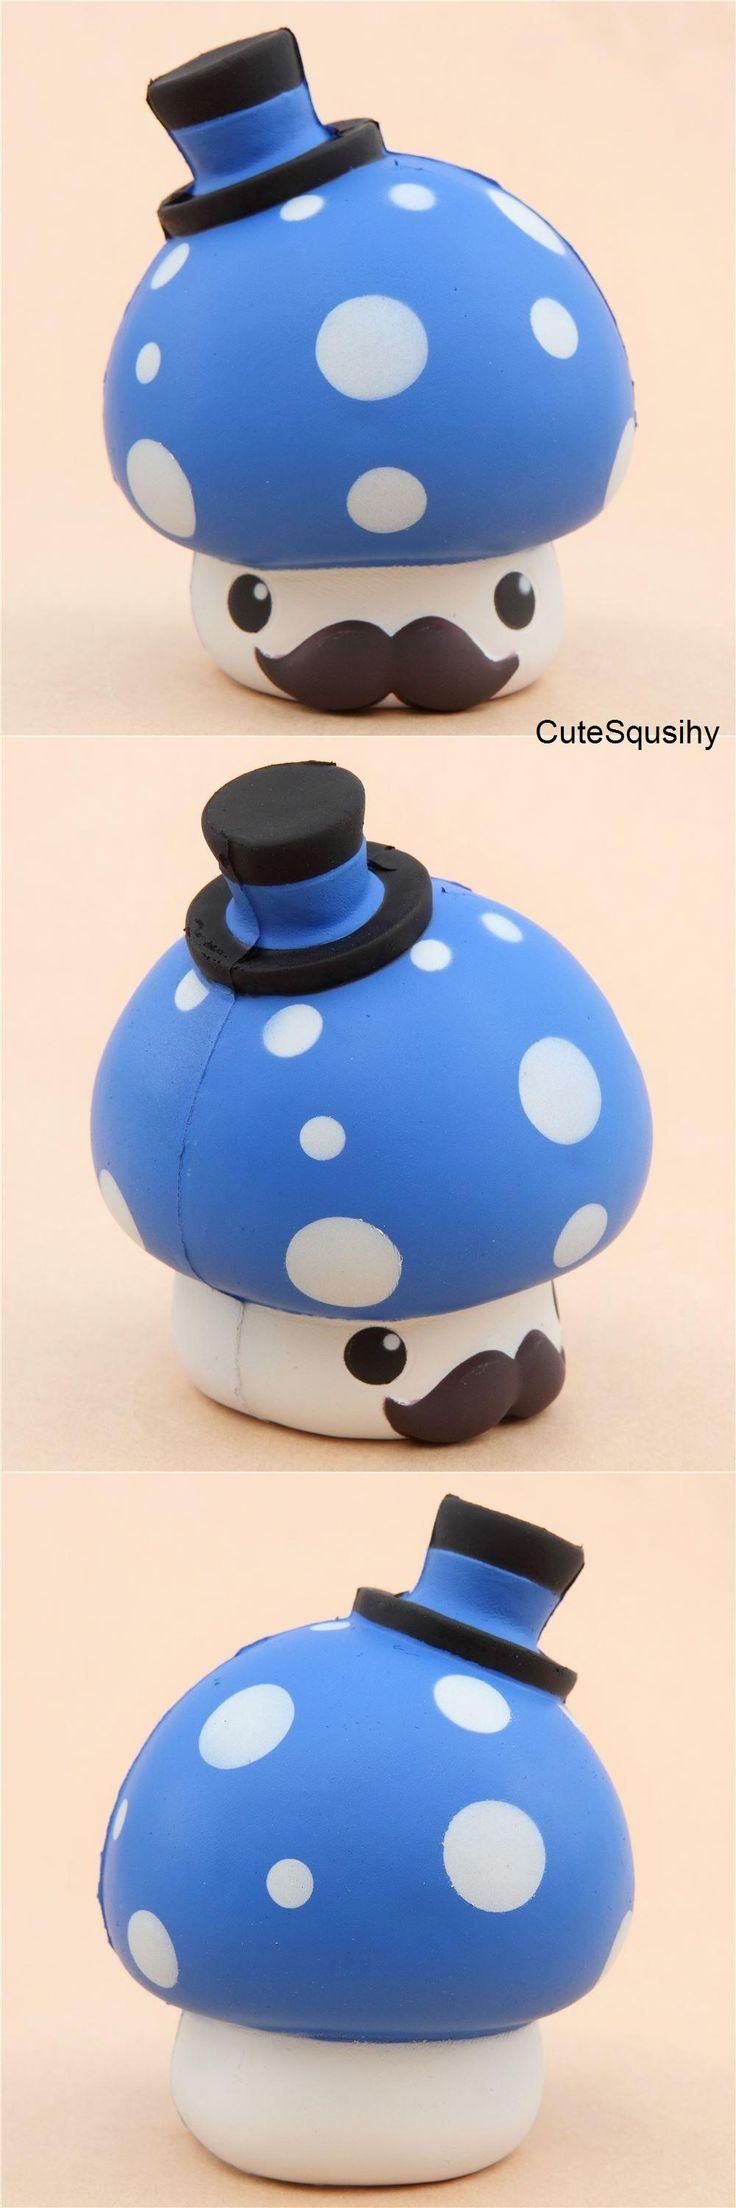 Kawaii blue mushroom squishy!